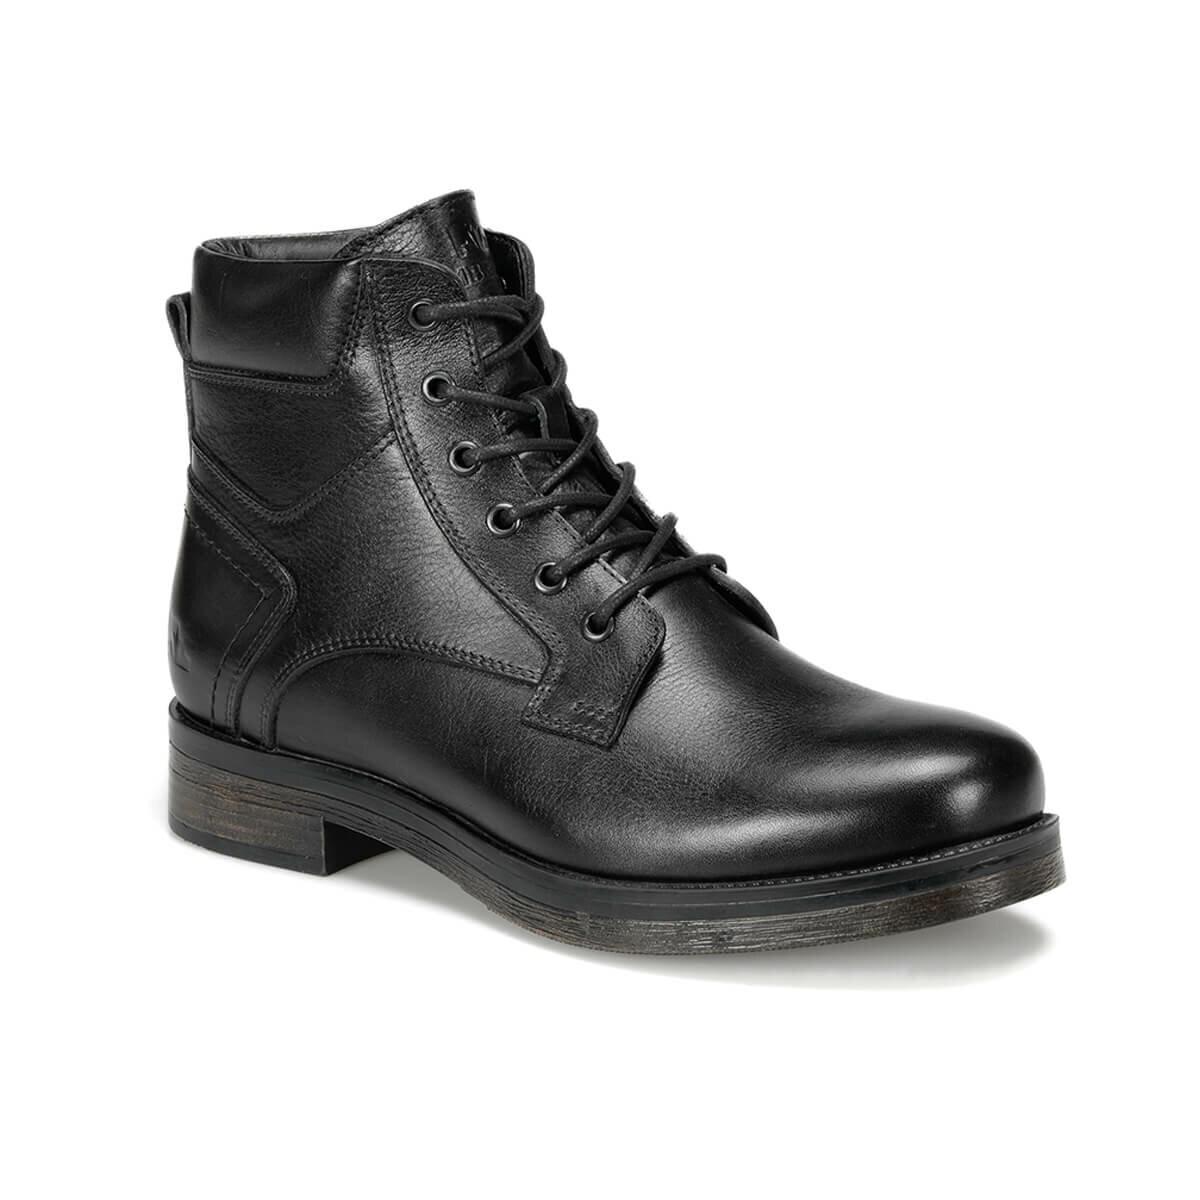 FLO NIKO 9PR Black Men Boots LUMBERJACK